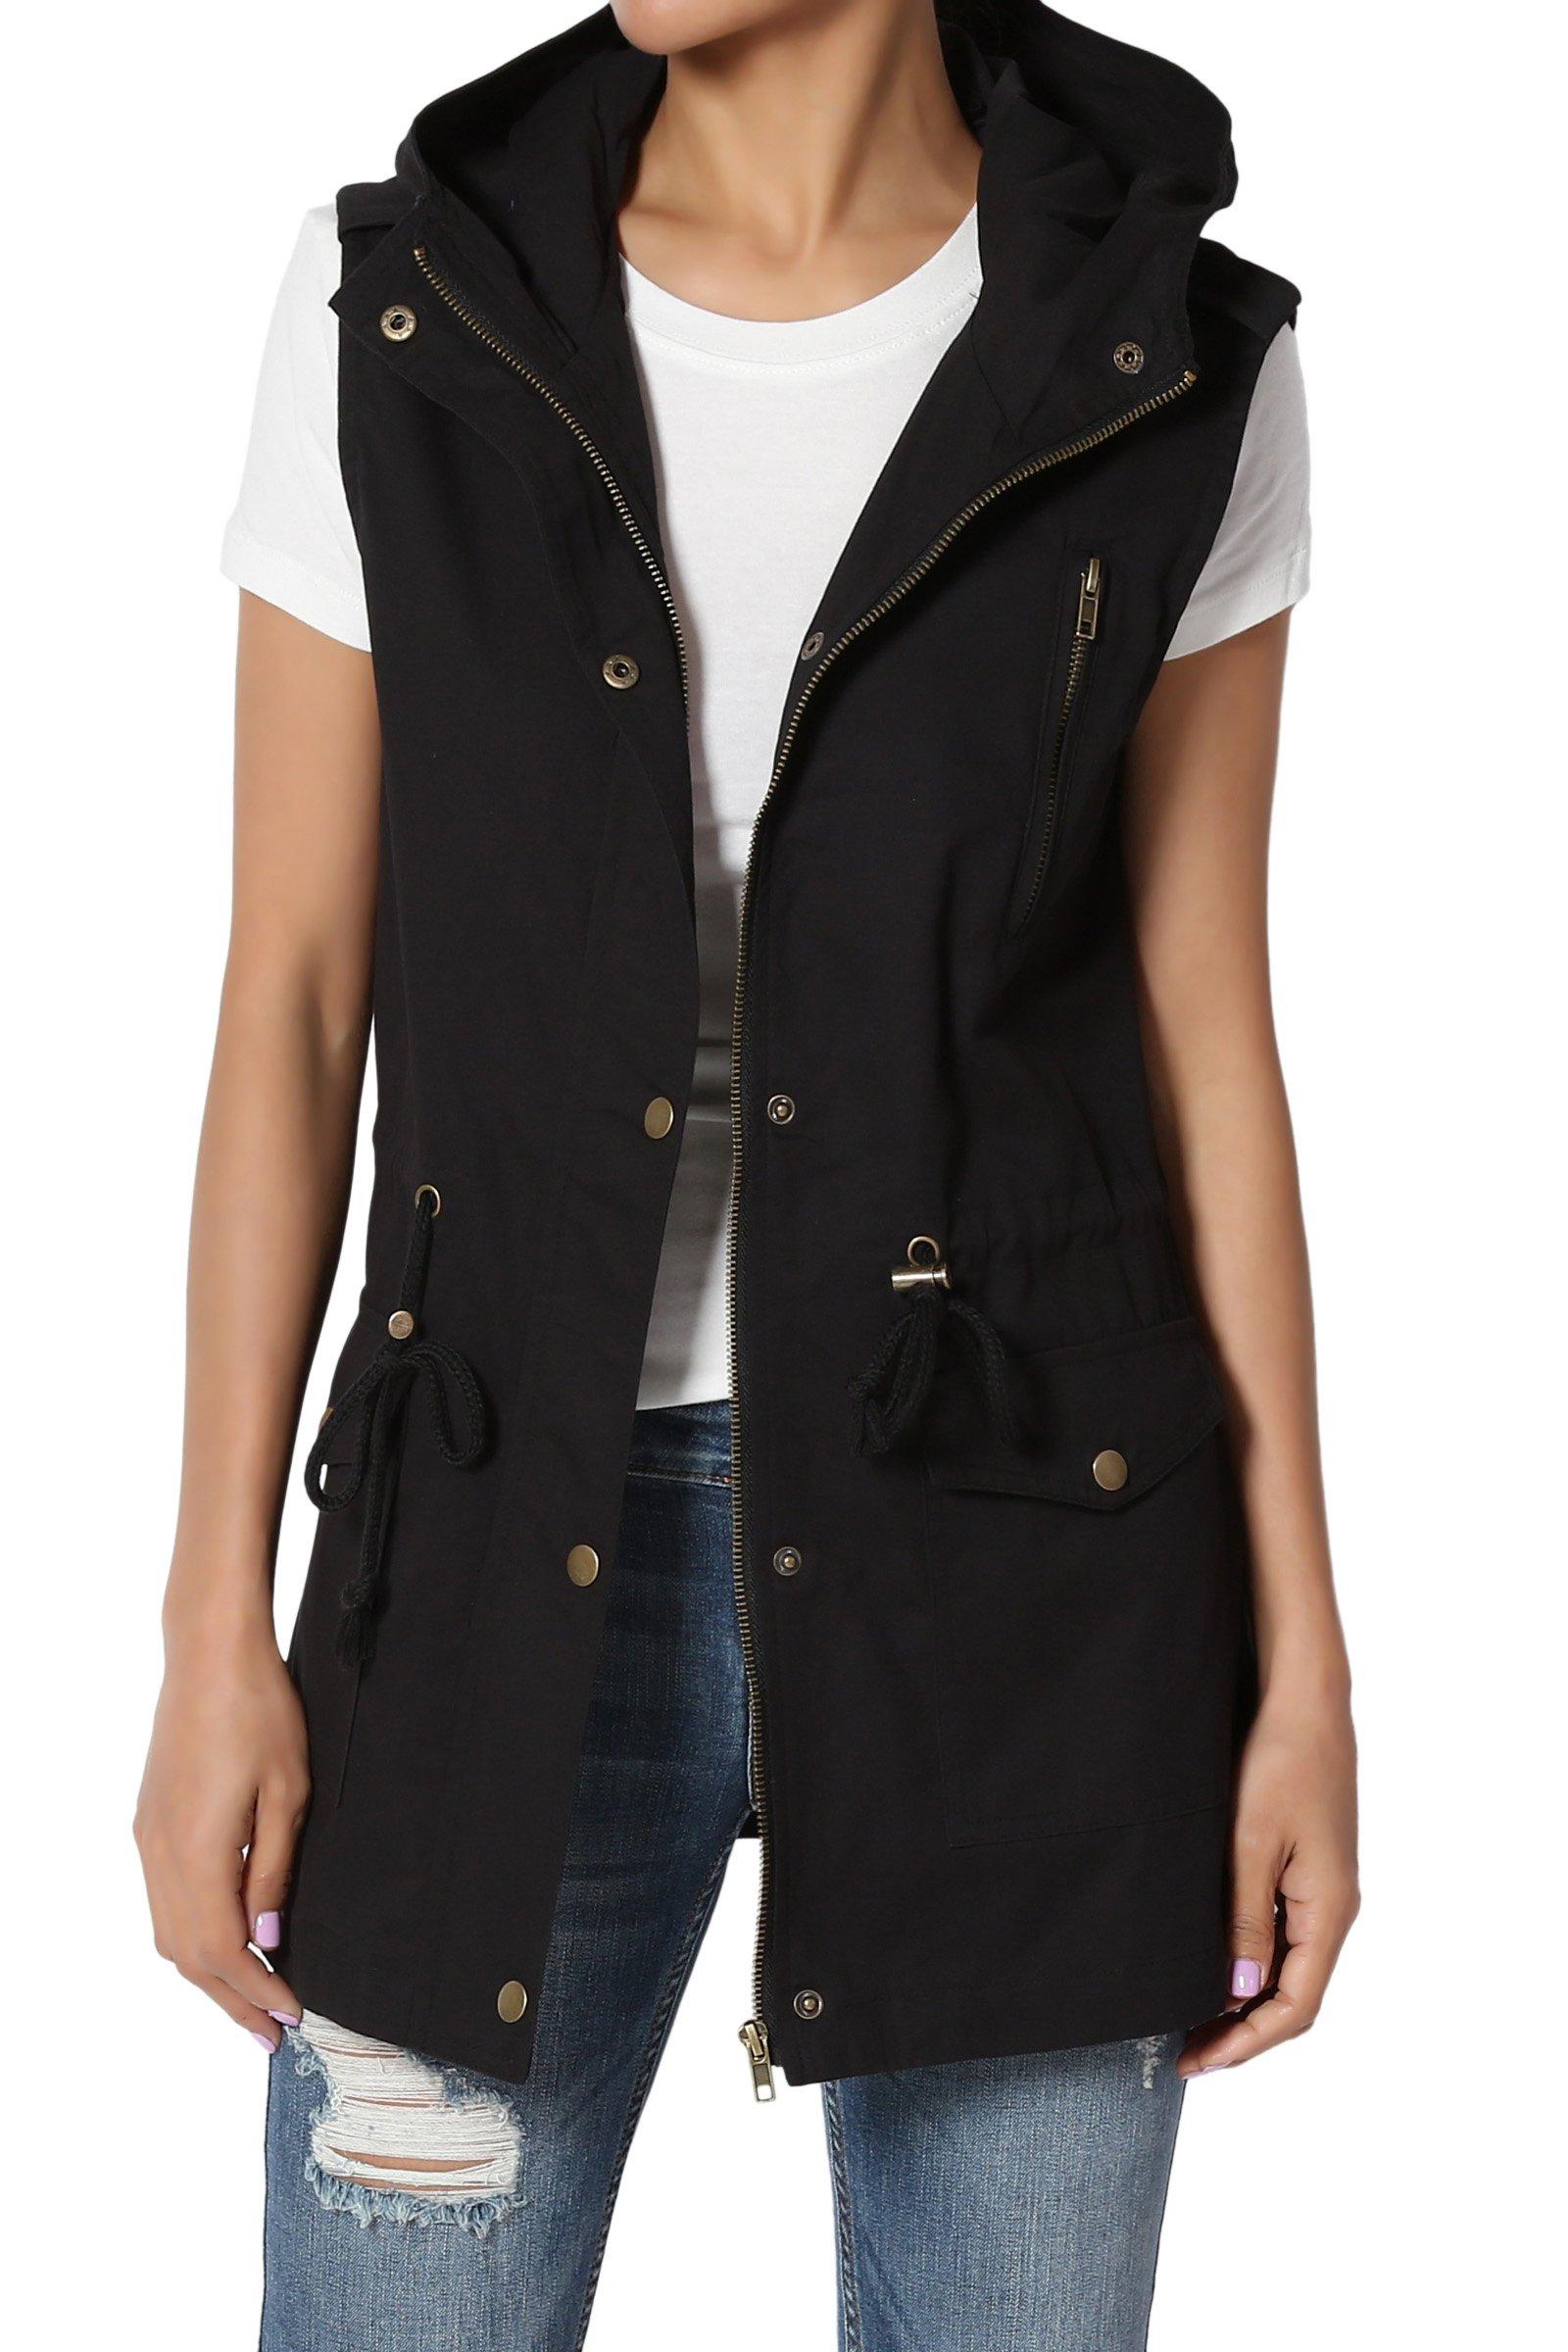 TheMogan Women's Military Drawstring Waist Loose Fit Utility Hoodie Vest Black L